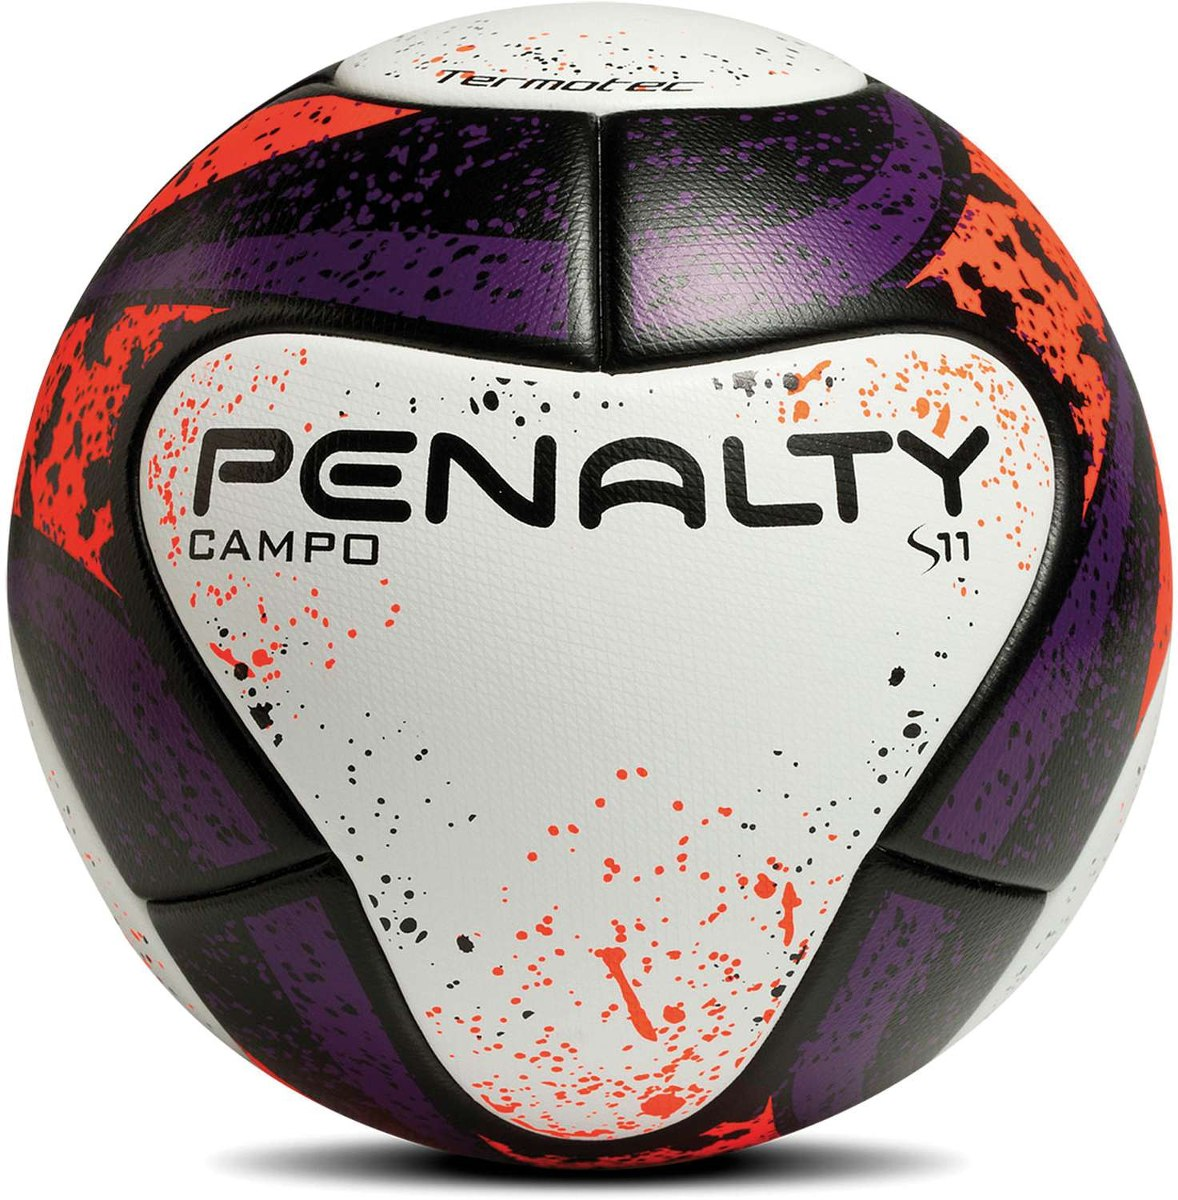 993bf3e04fb20 Bola De Futebol De Campo S11 R2 Fpf Termotec Bc-rs-az Un - R  283